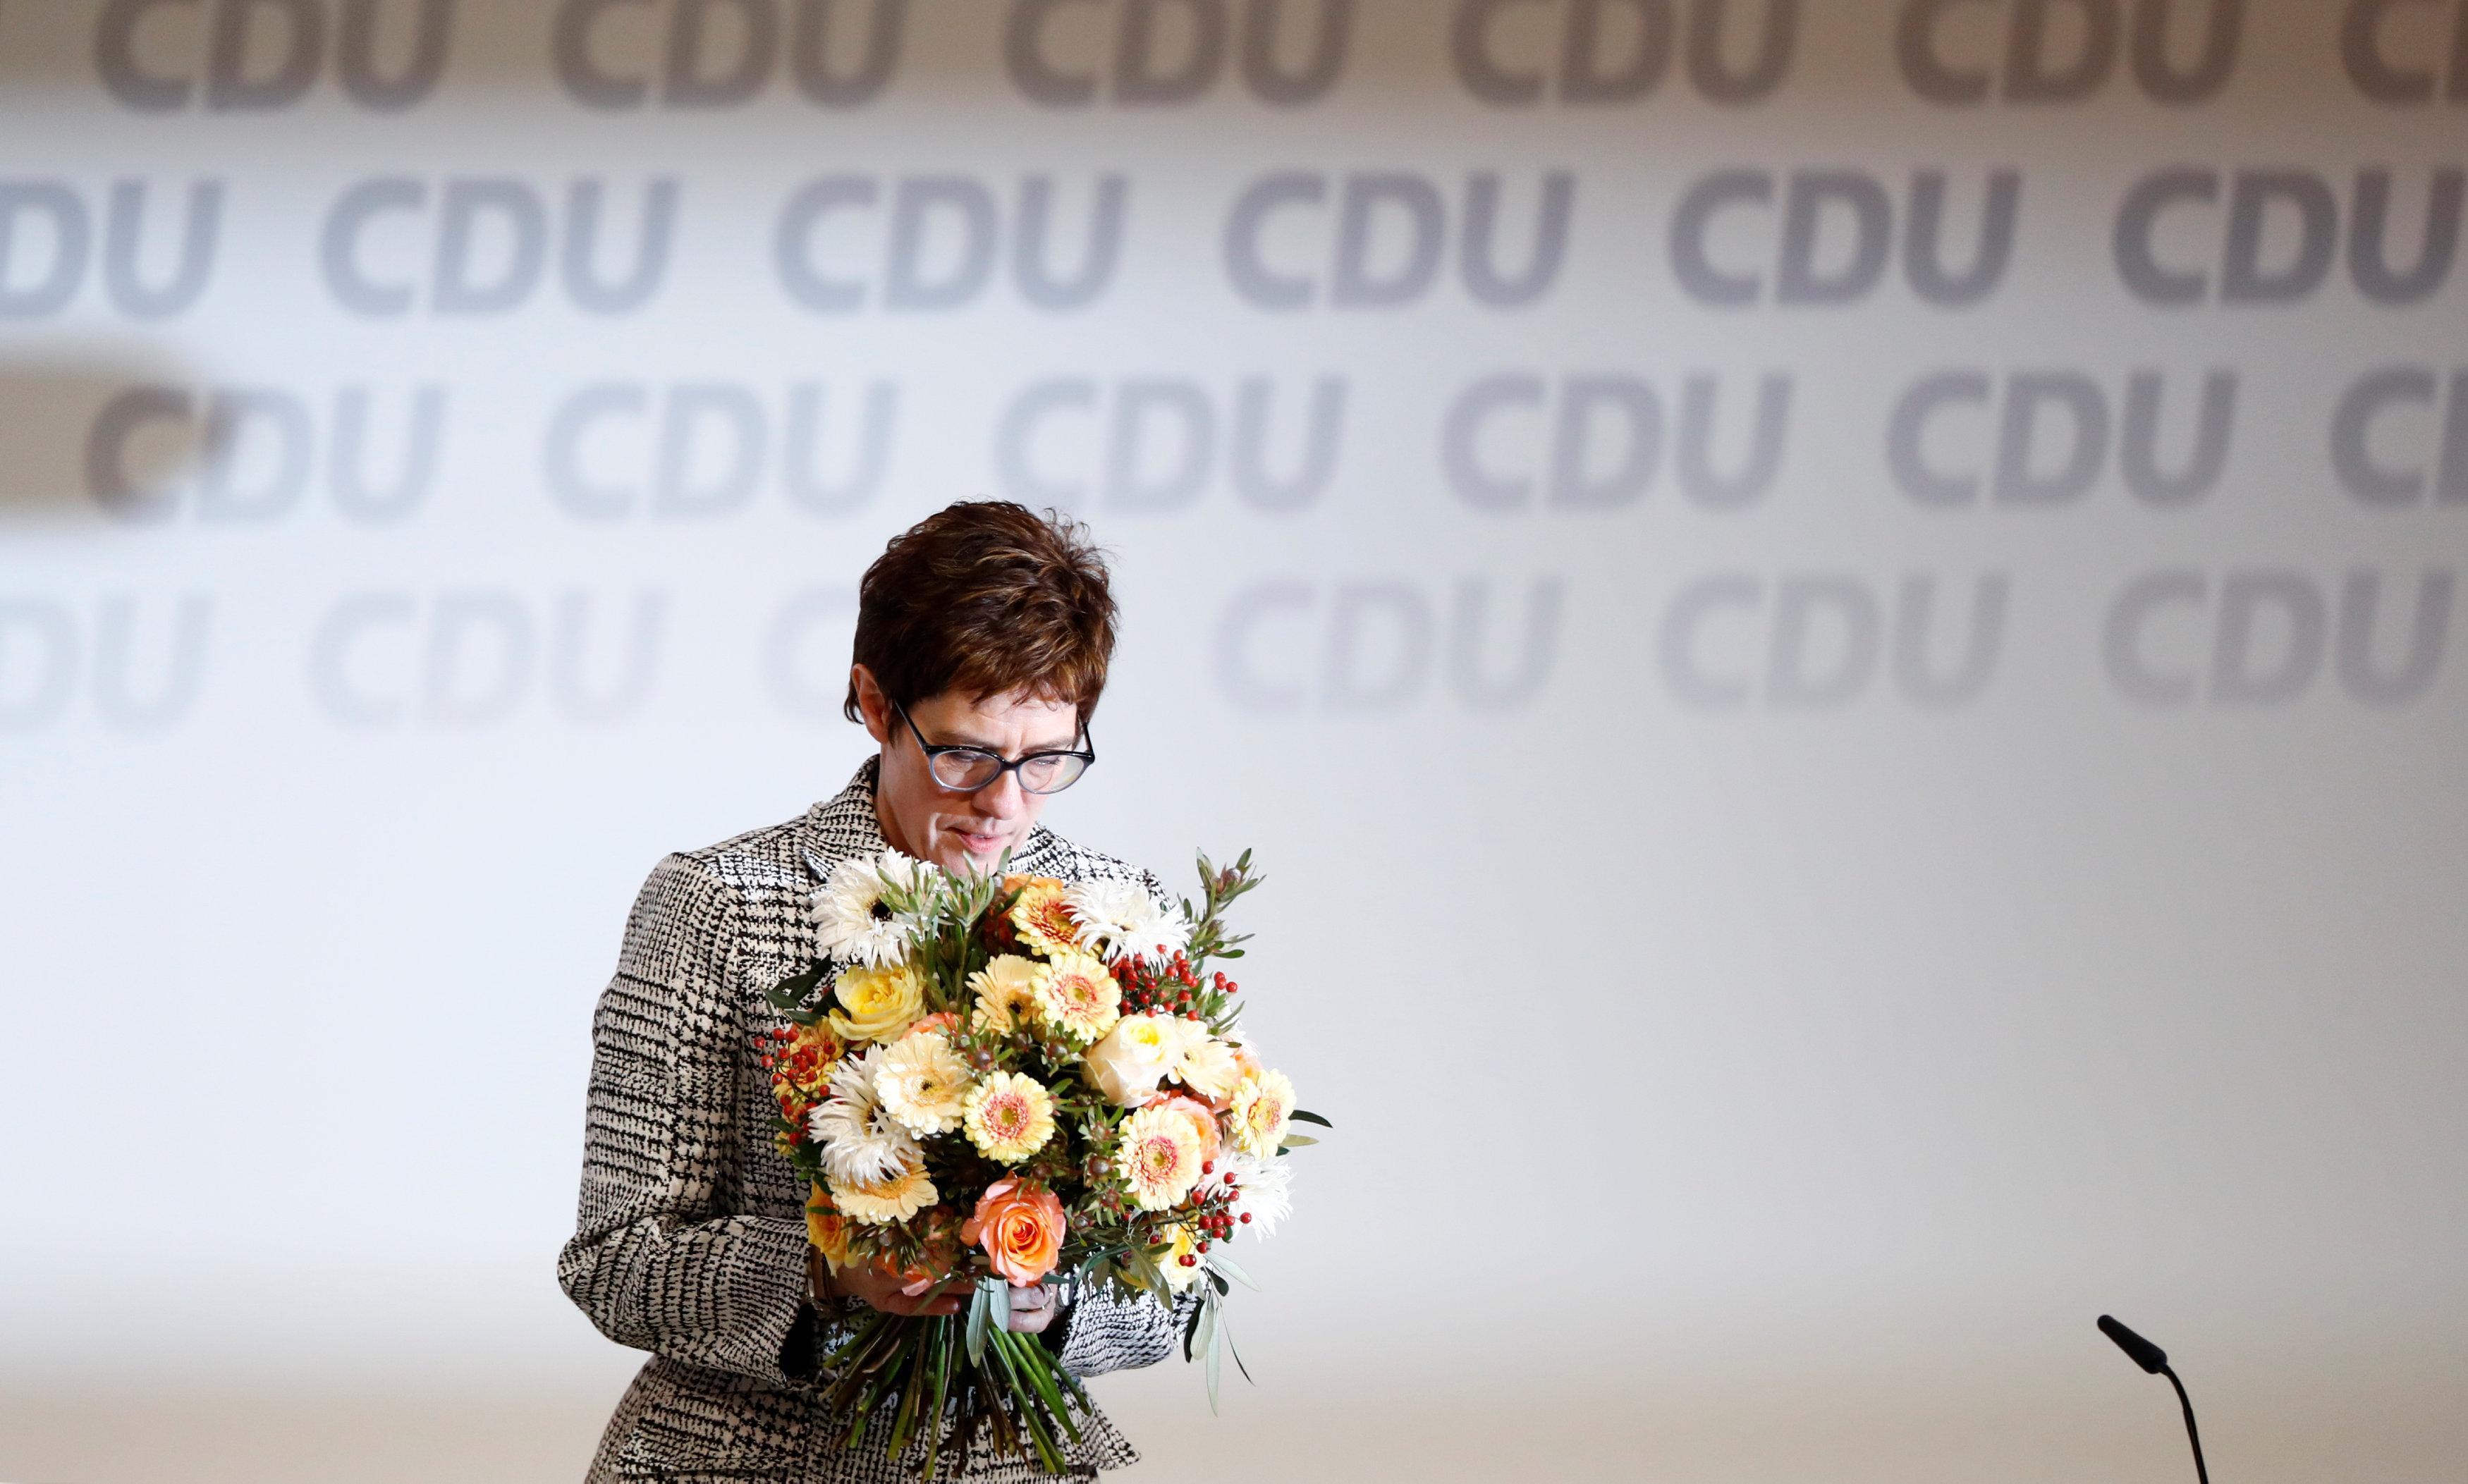 2018 12 07T164845Z 601672430 RC1D523935E0 RTRMADP 3 GERMANY POLITICS CDU